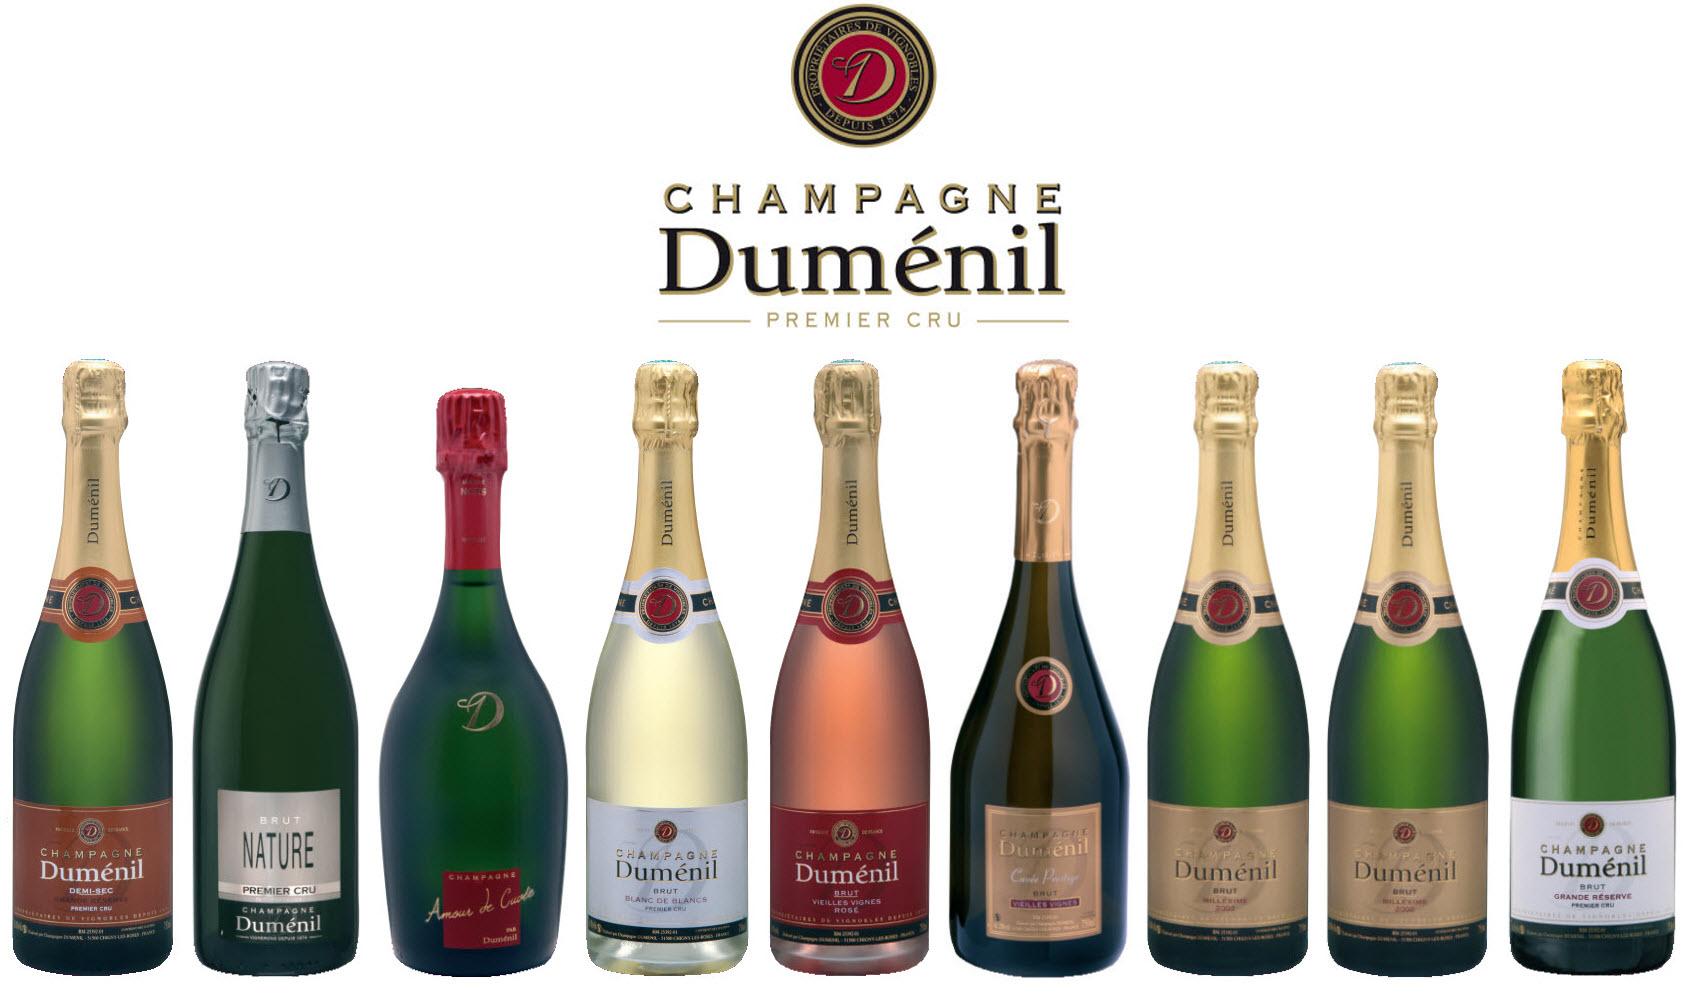 Champagne Duménil